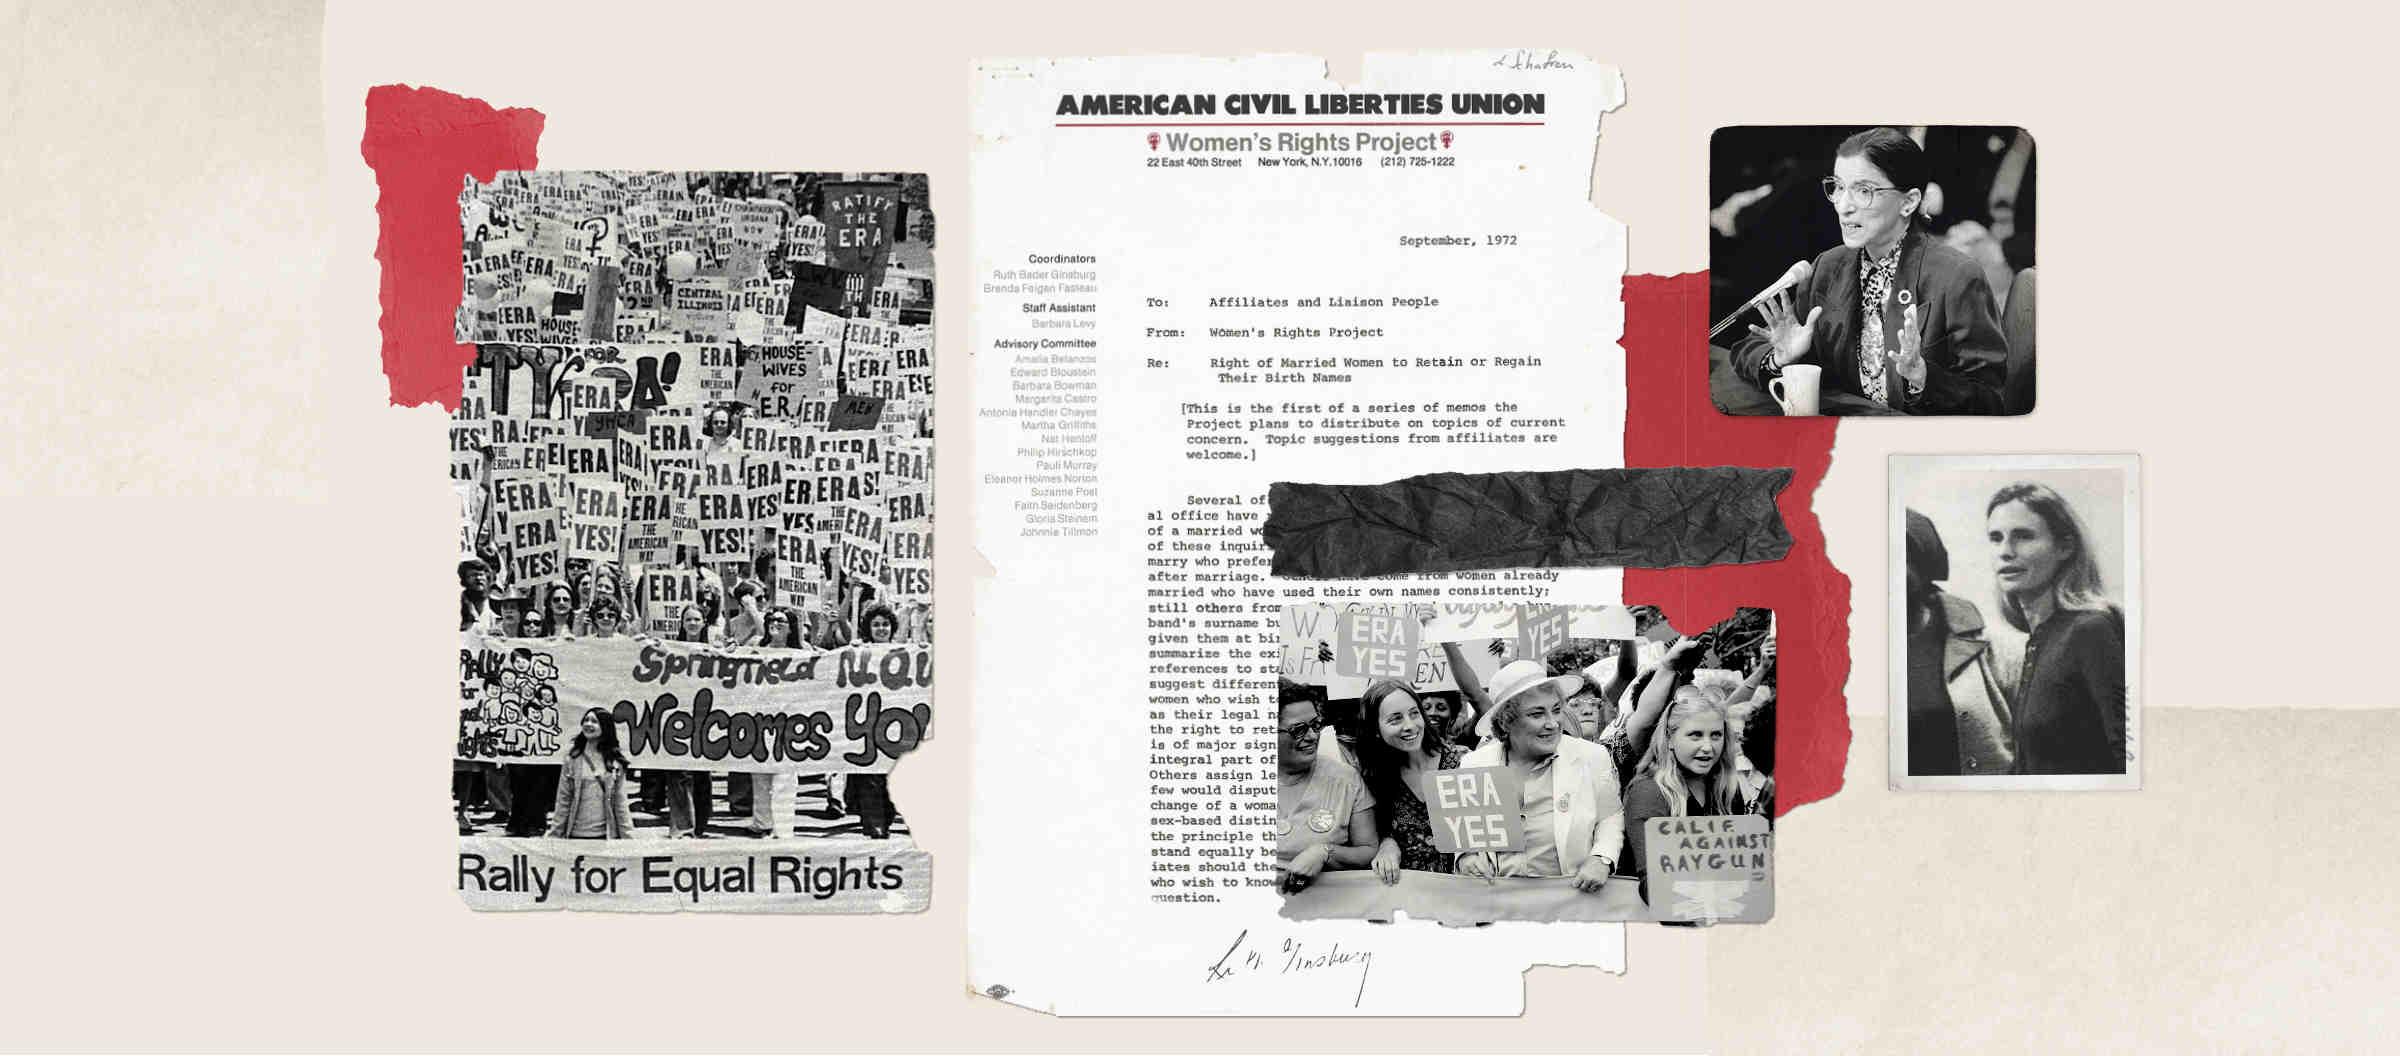 The ACLU, Ruth Bader Ginsburg, and Me